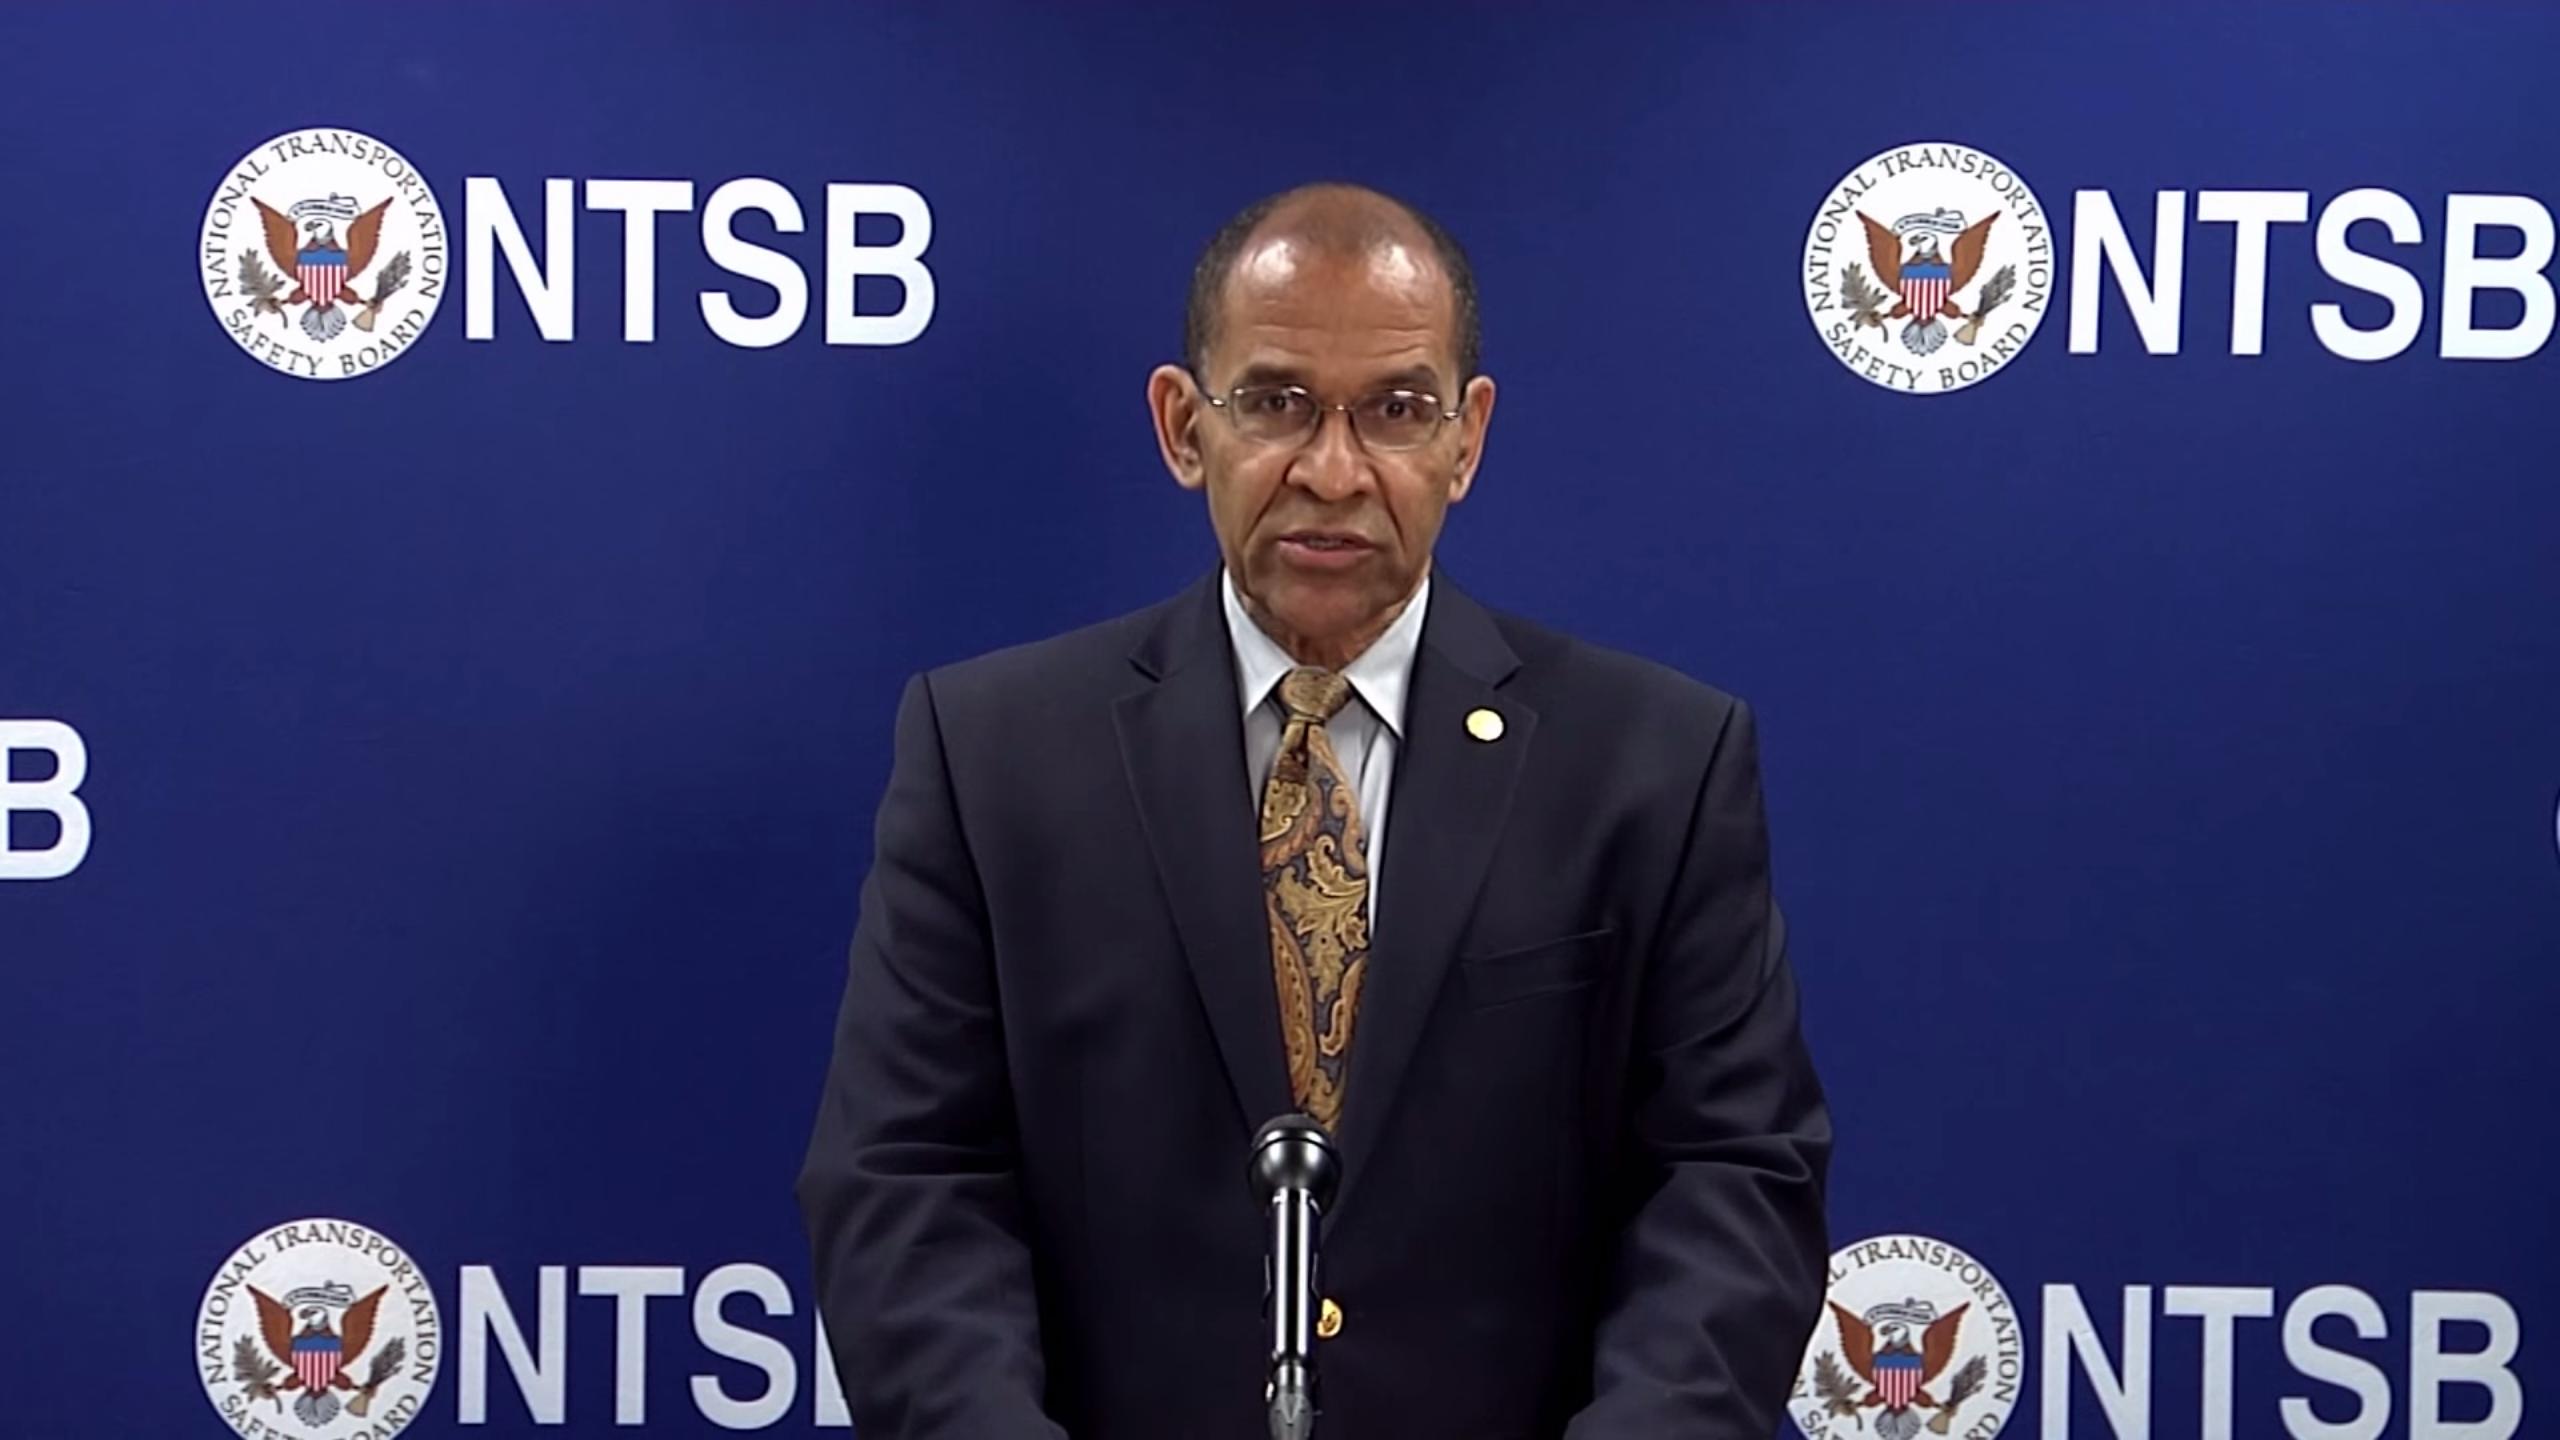 NTSB: Collision Avoidance Tech Should Be Standard